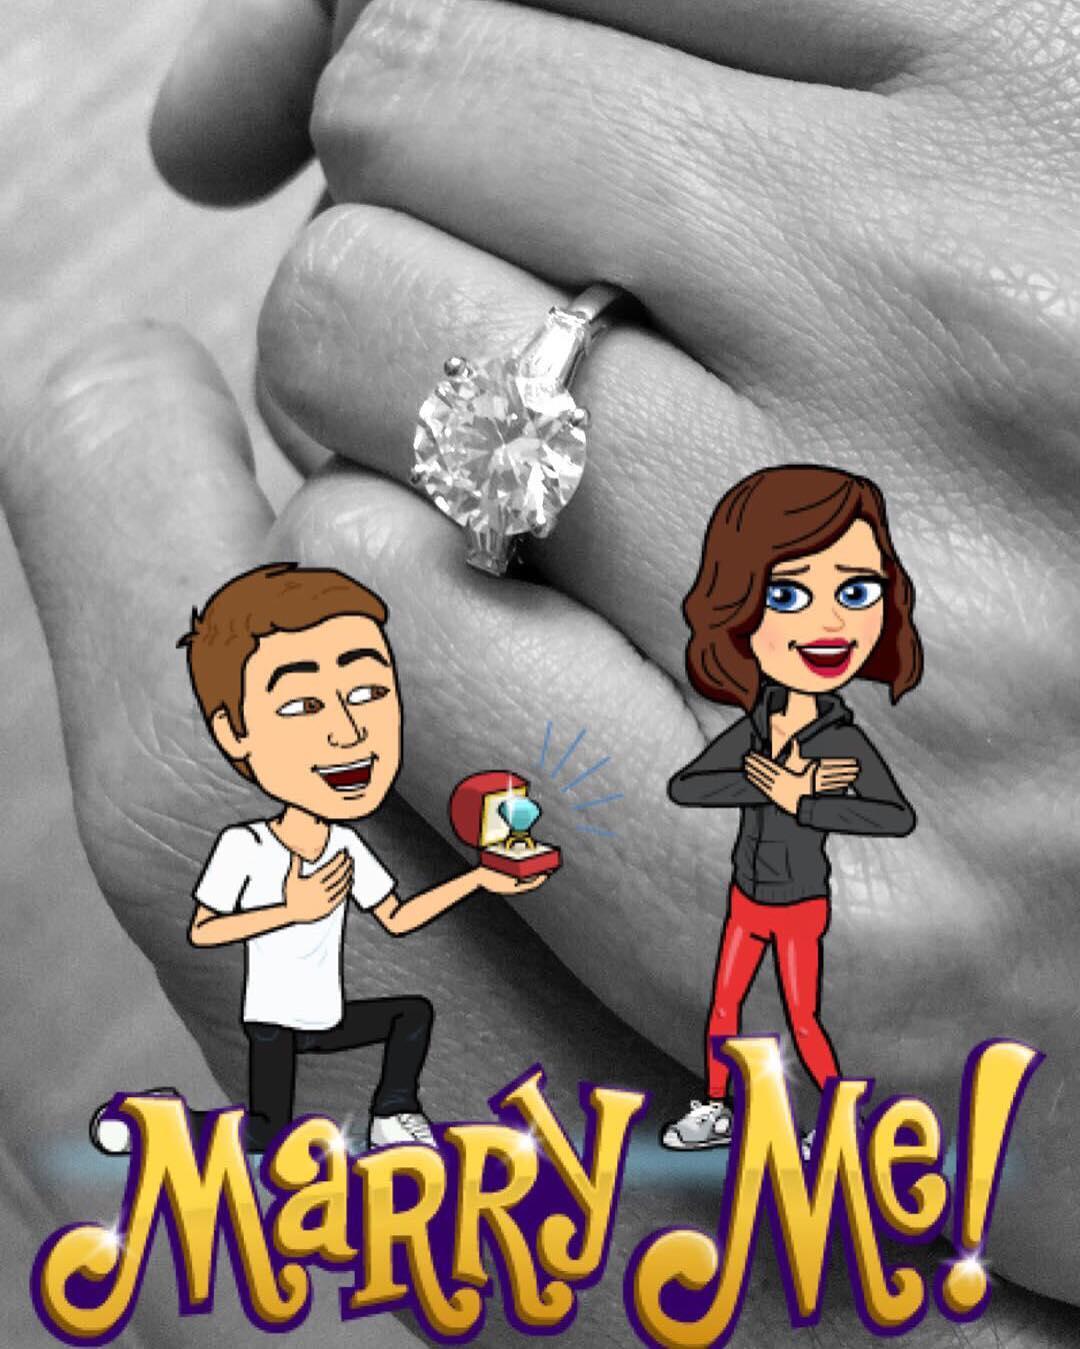 7月21日Miranda Kerr於Instagram上宣佈,男友Evan Spiegel已求婚,並回應「I said yes」。